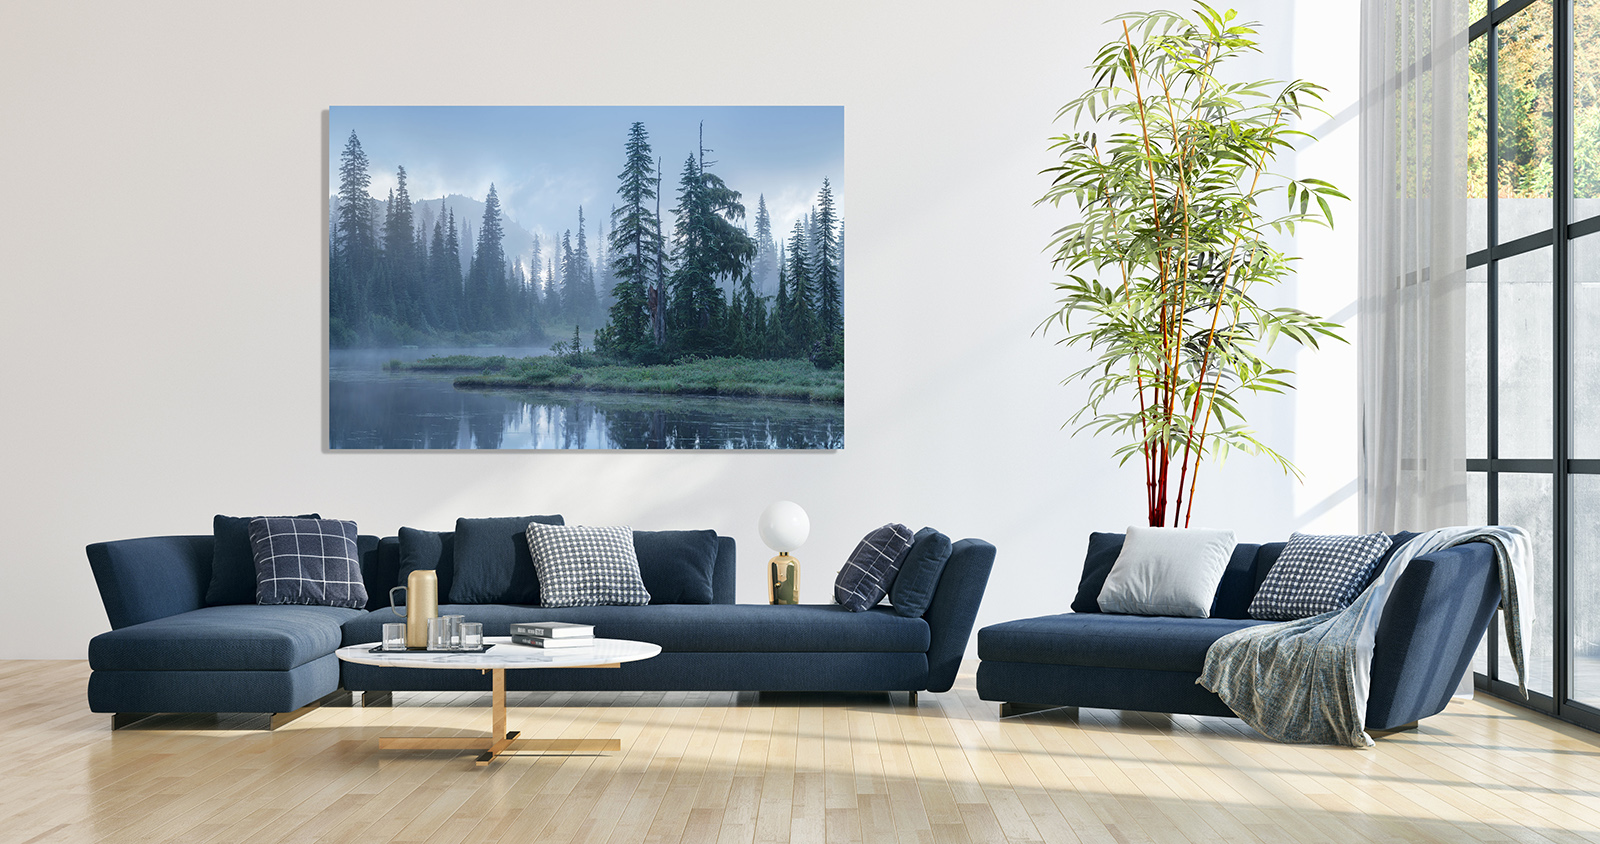 3d, apartment, architecture, background, bright, chair, clean, comfortable, contemporary, concept, construction, cushion, decoration...